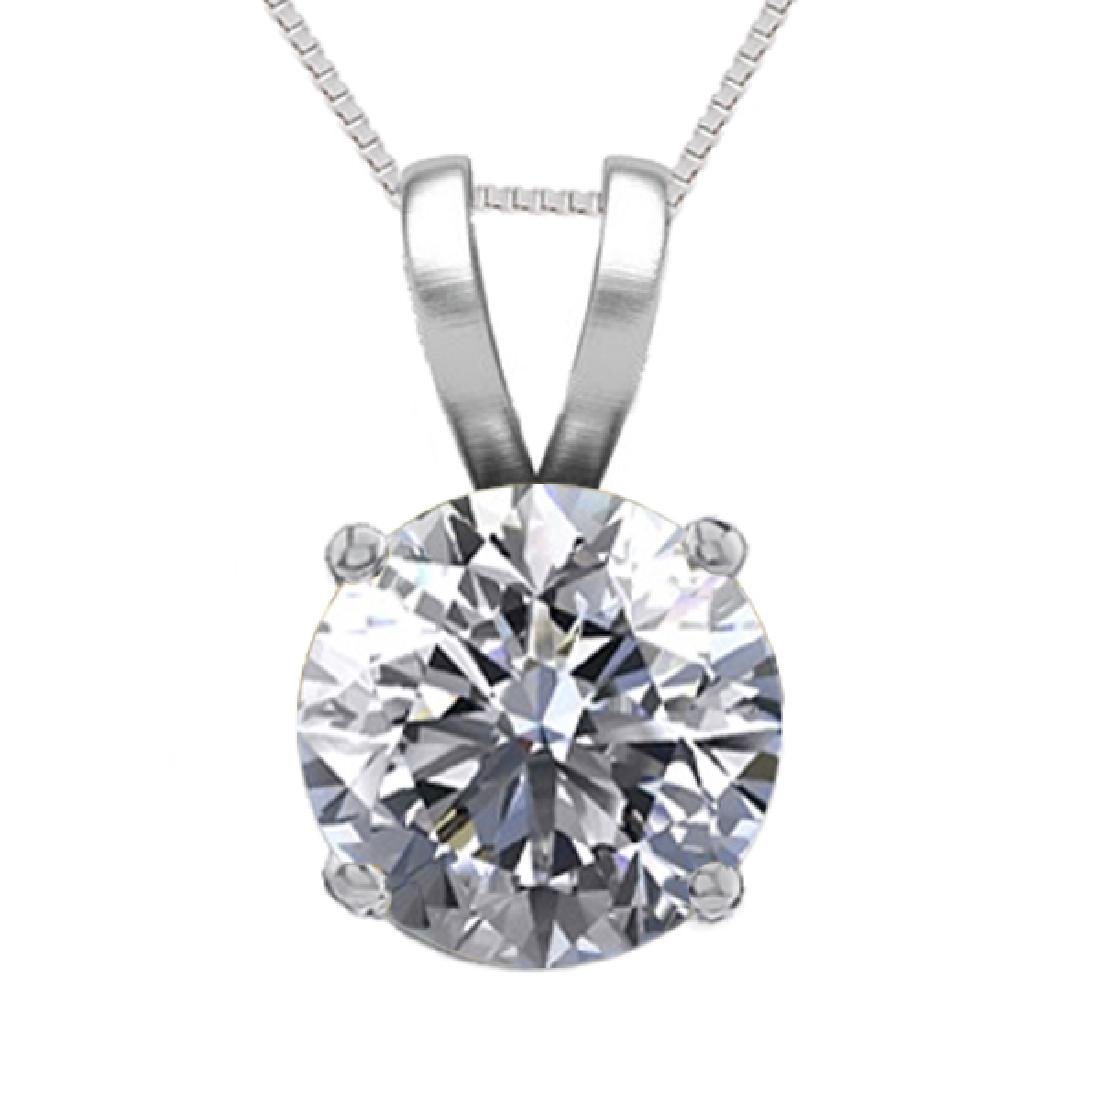 14K White Gold 1.05 ct Natural Diamond Solitaire